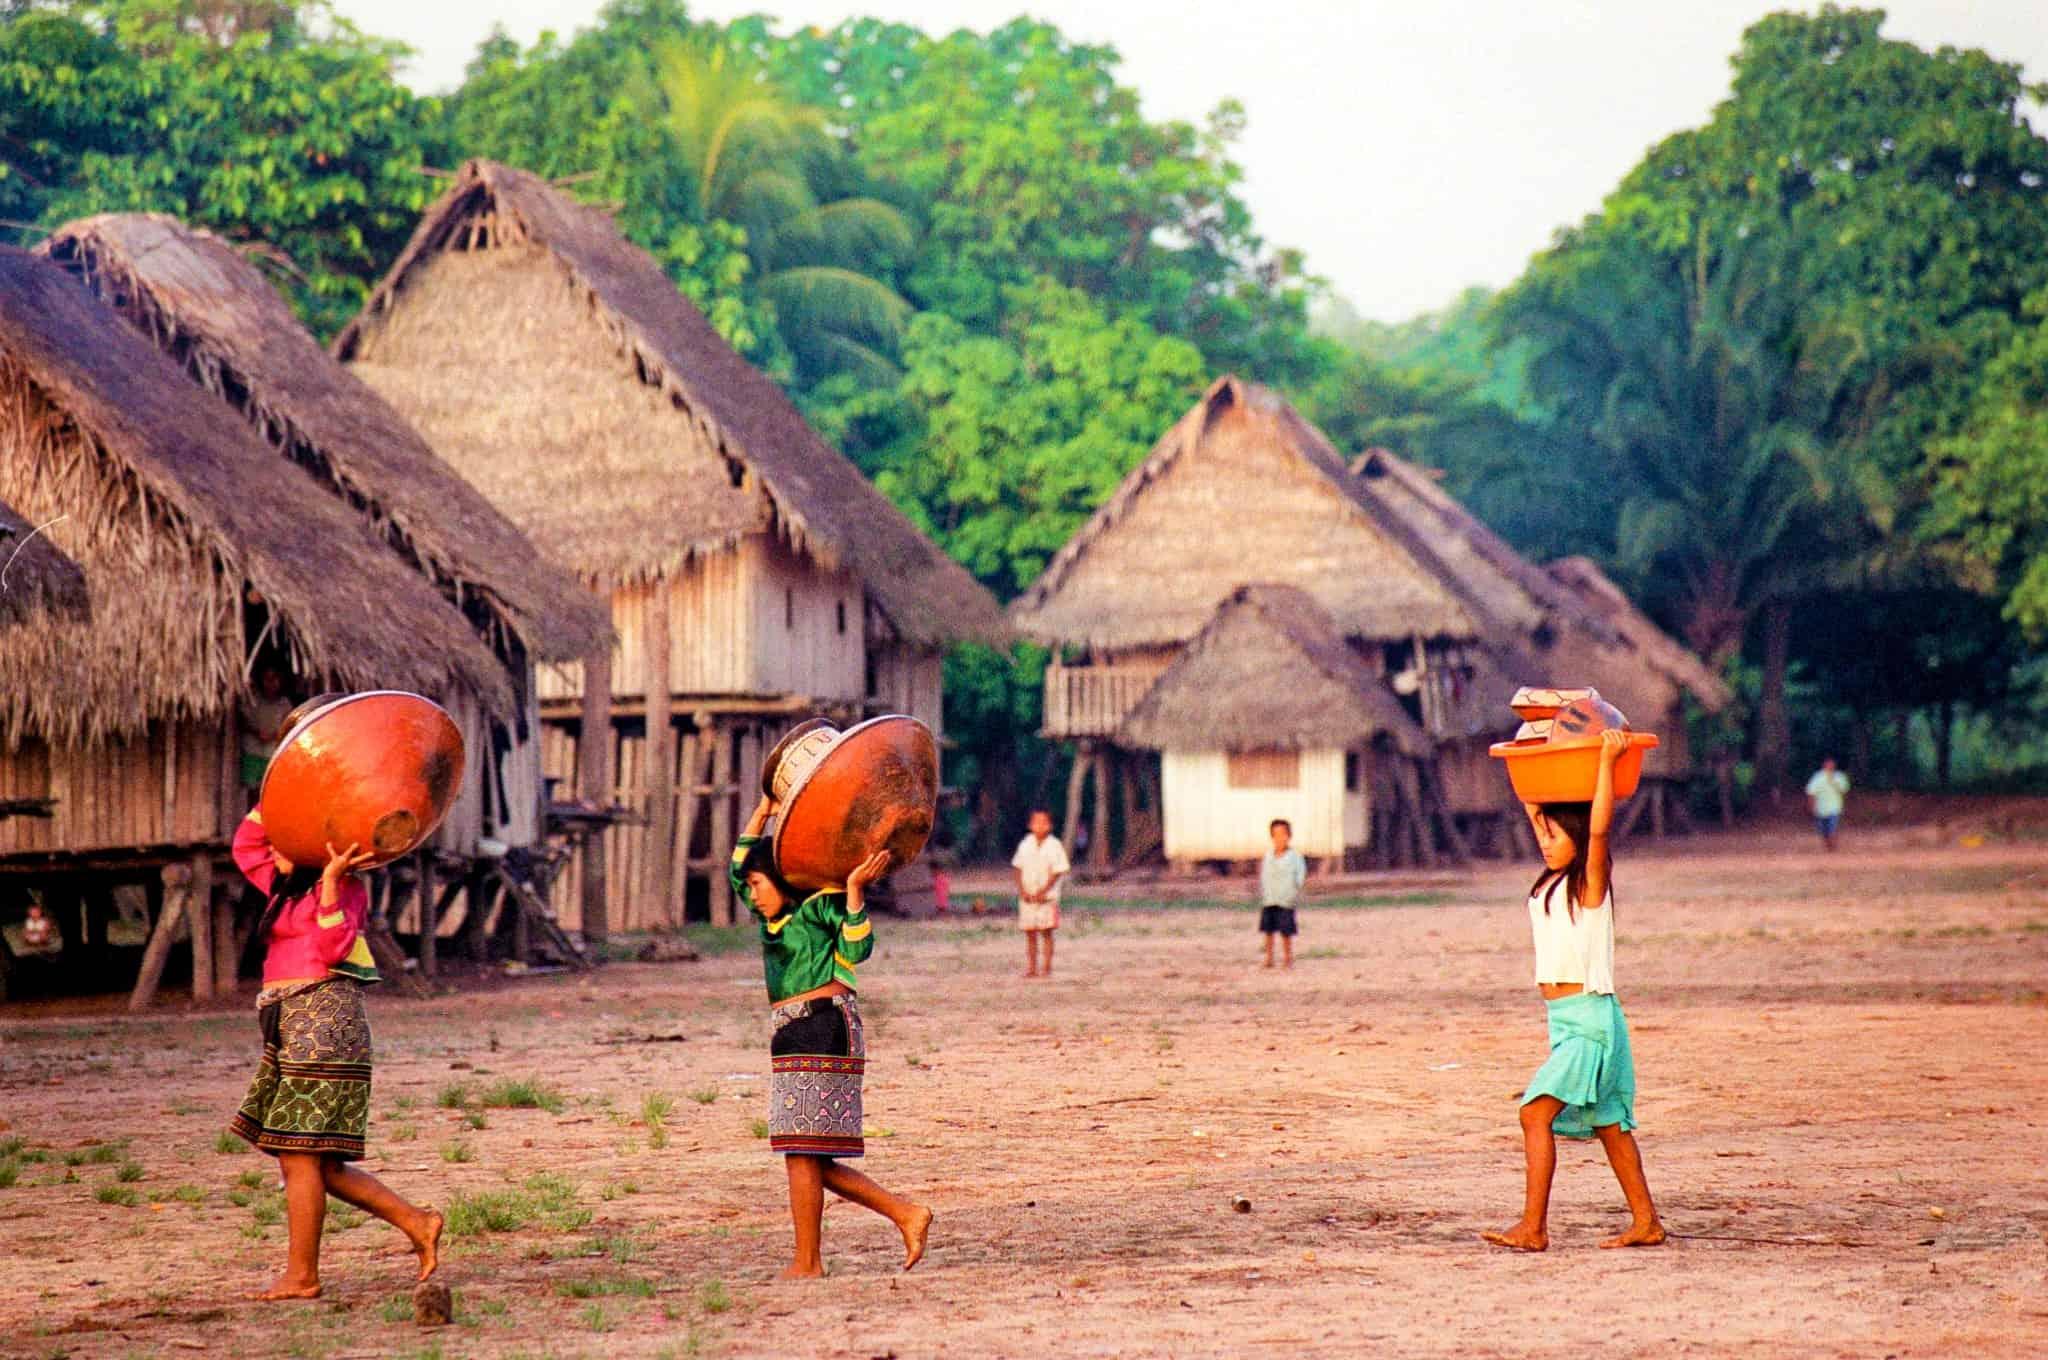 Women carrying baskets in a village near the Cordillera Azul project. Photo © Nancy Stone.